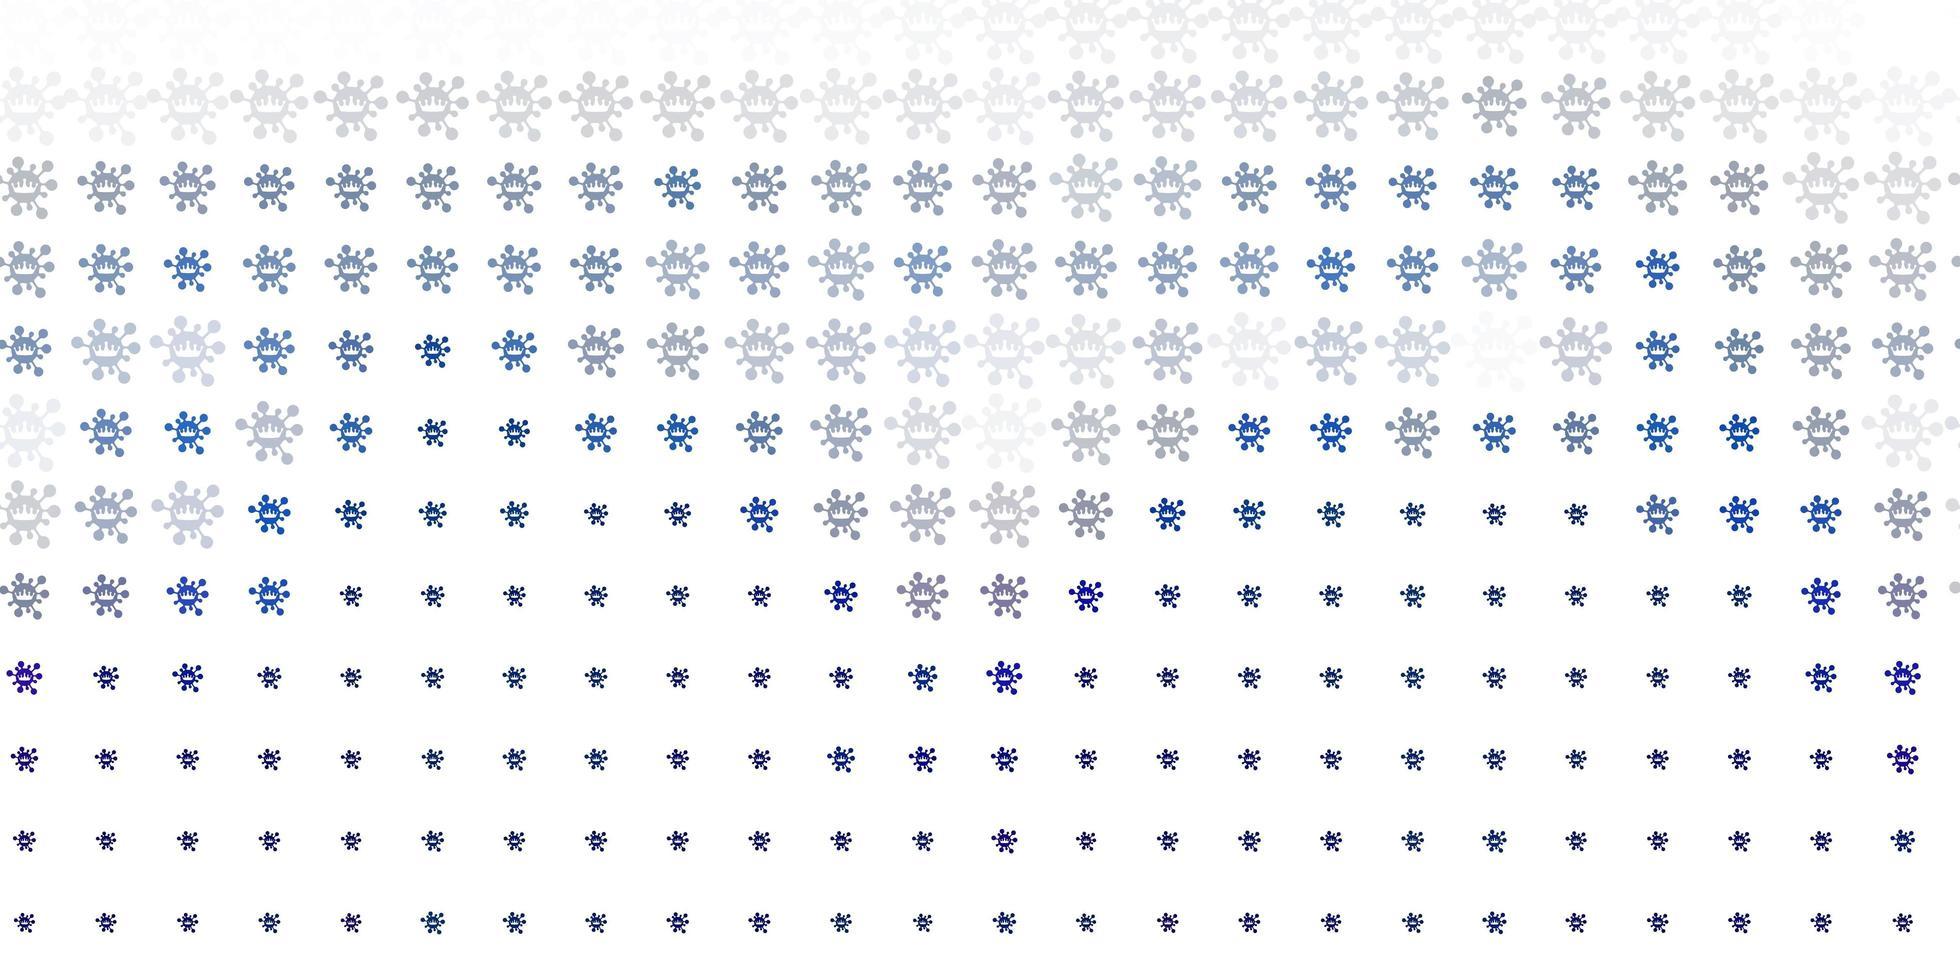 fundo cinza claro com símbolos covid-19. vetor